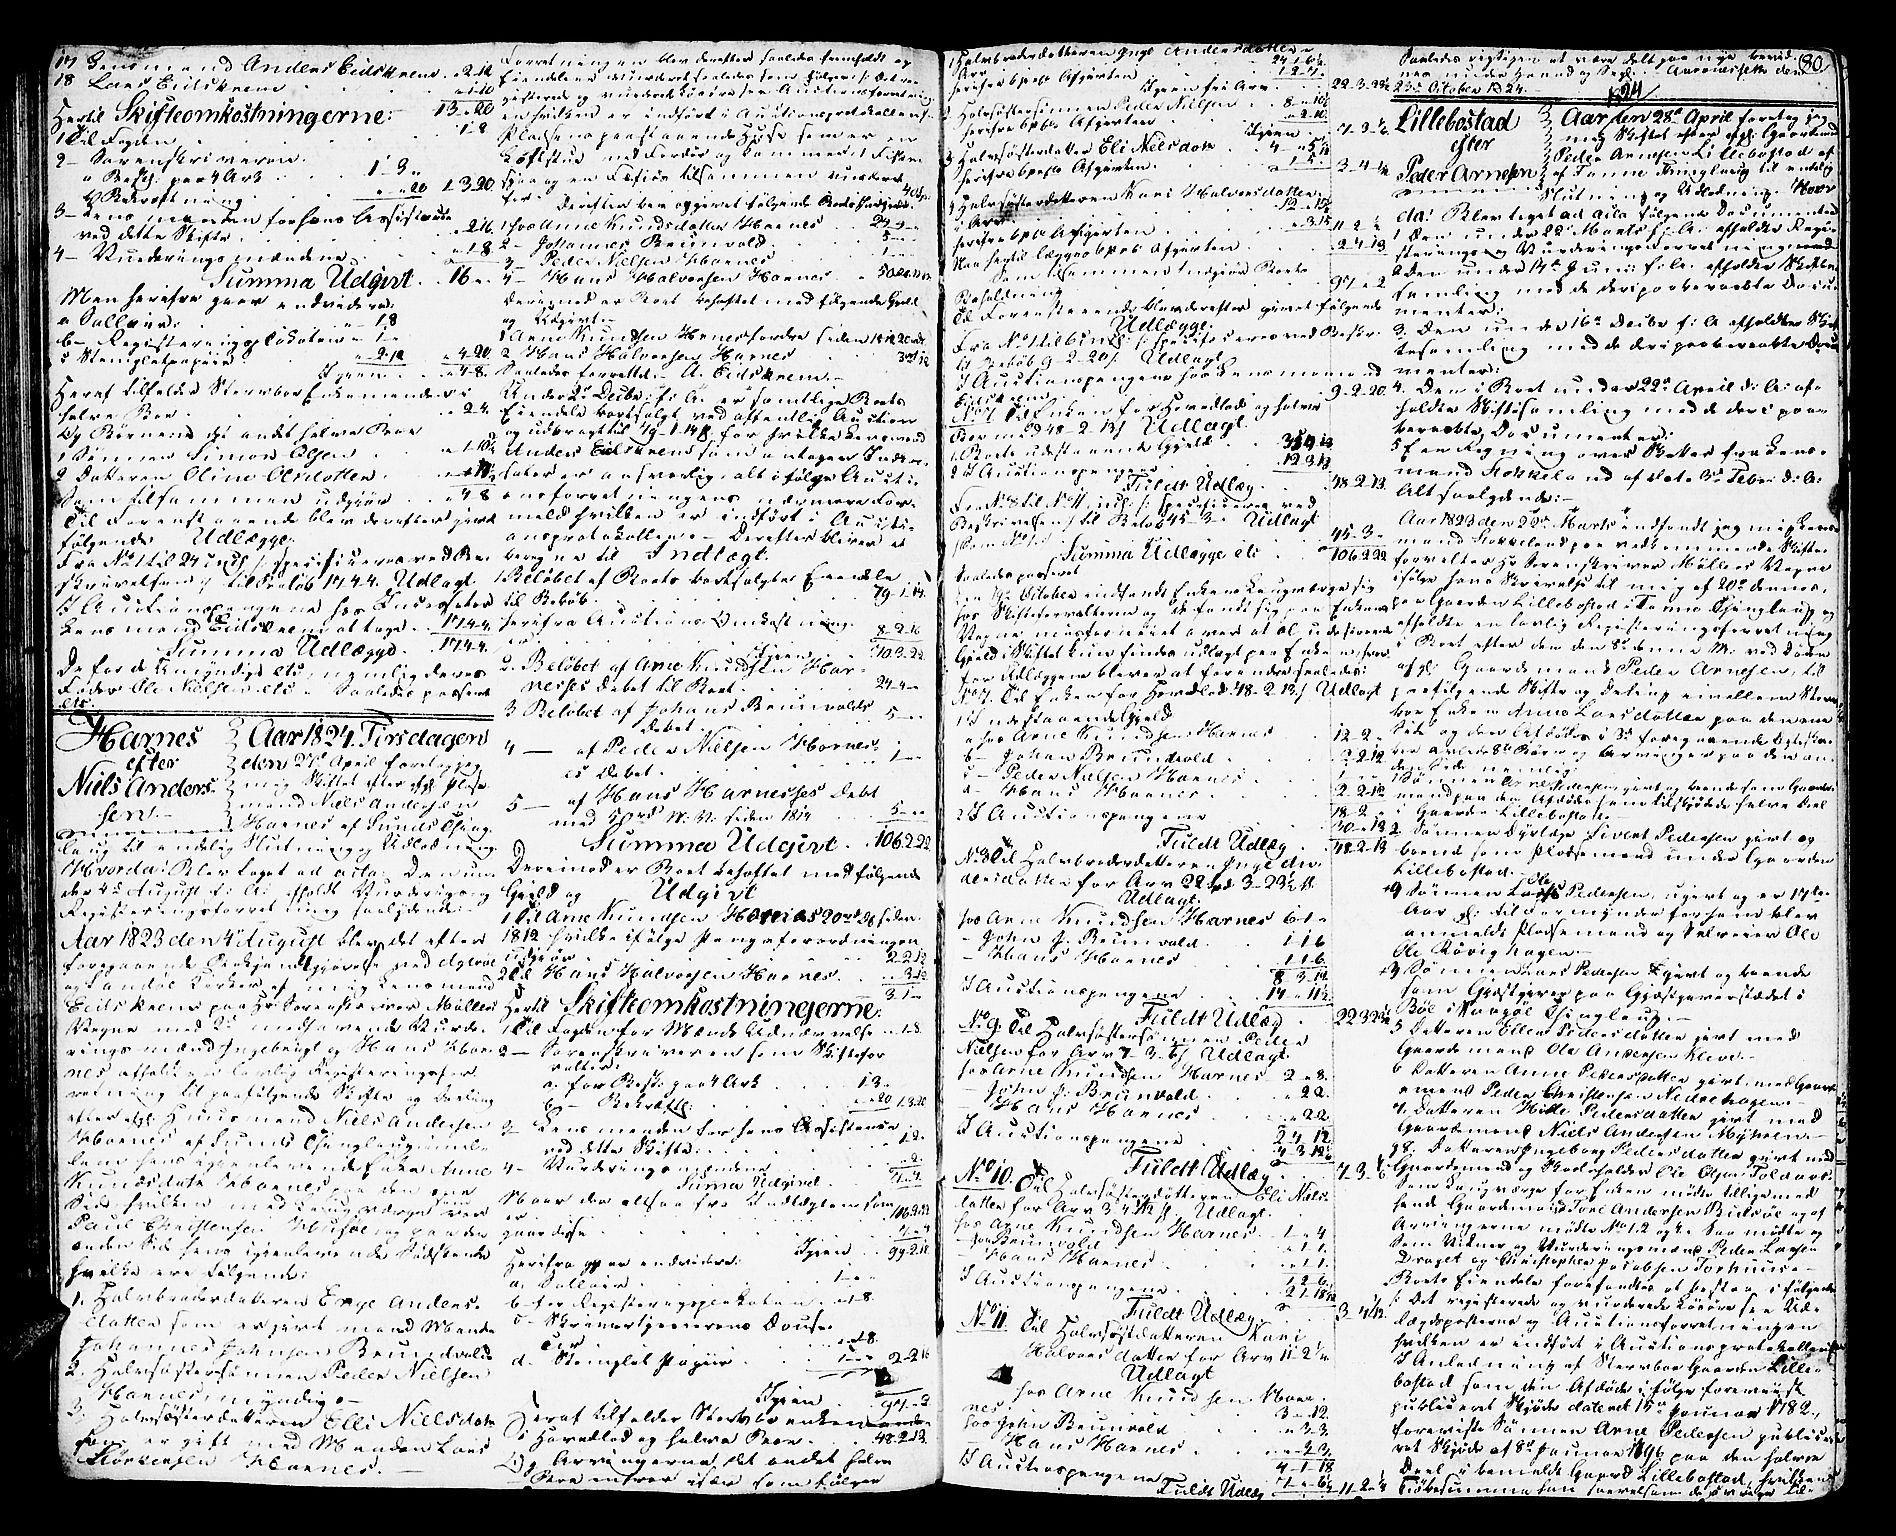 SAT, Romsdal sorenskriveri, 3/3A/L0016: Skifteutlodnings Protokoll 2, 1823-1831, s. 80